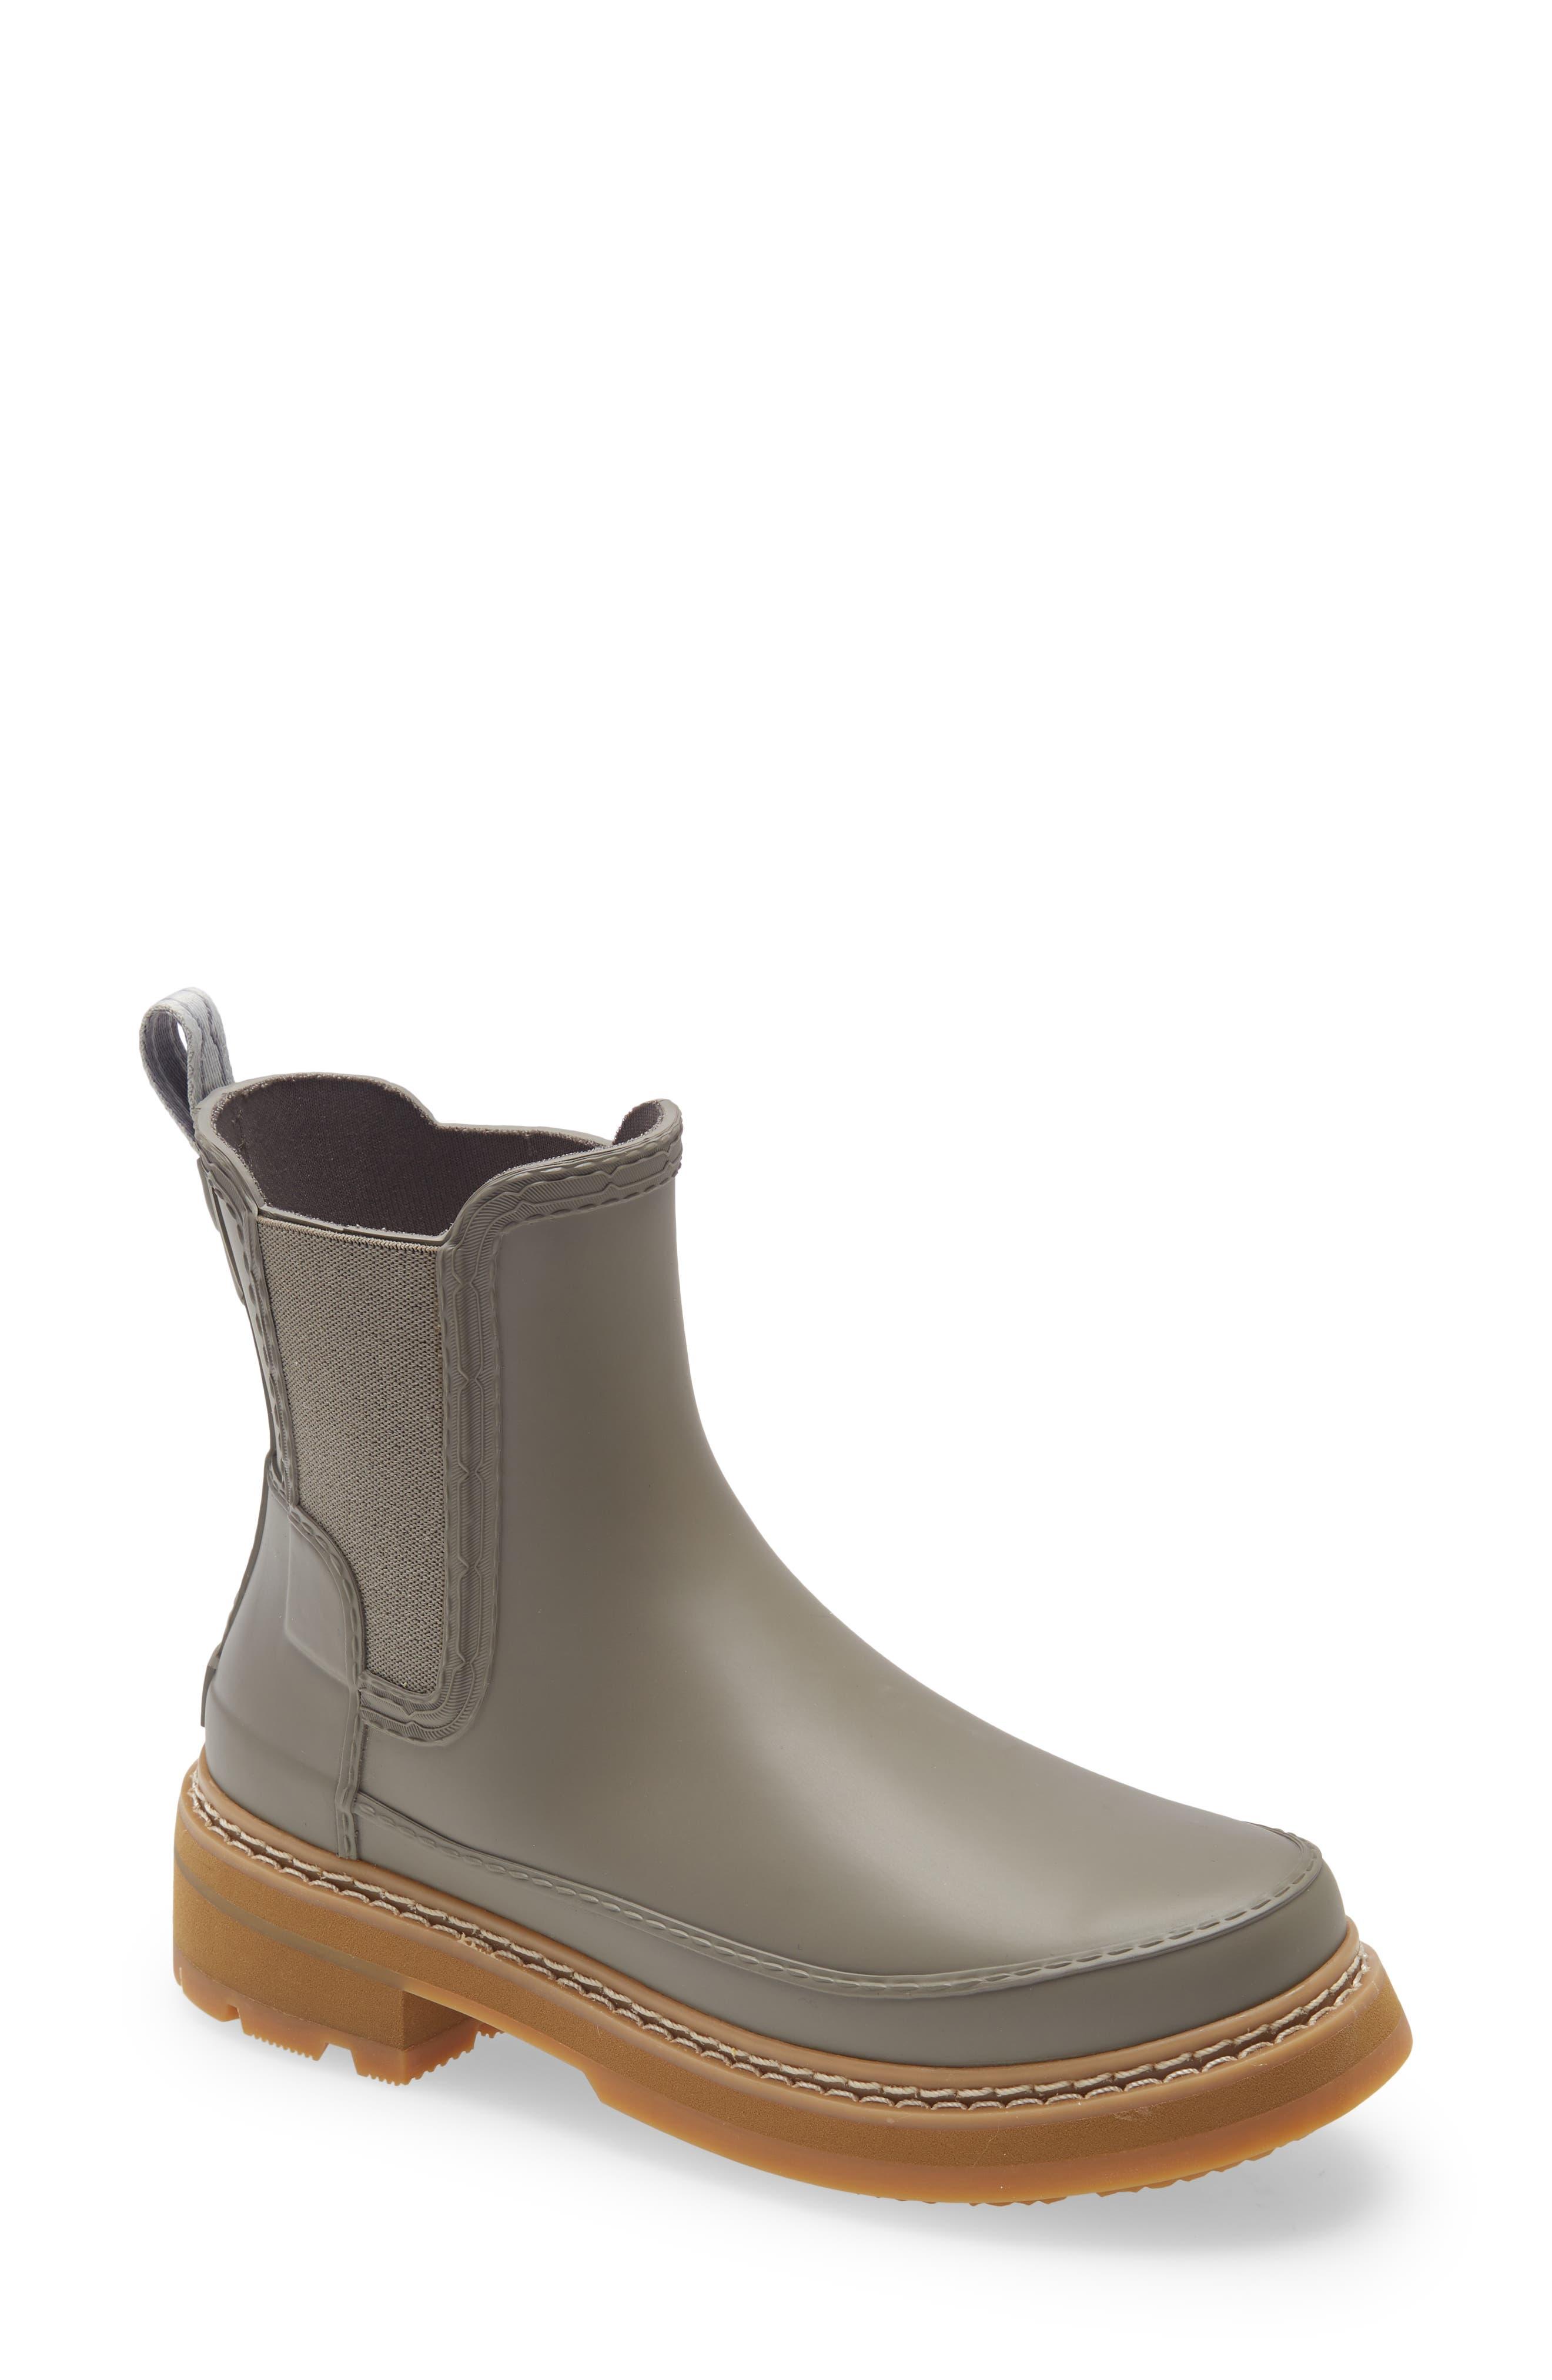 Refined Stitch Waterproof Chelsea Boot